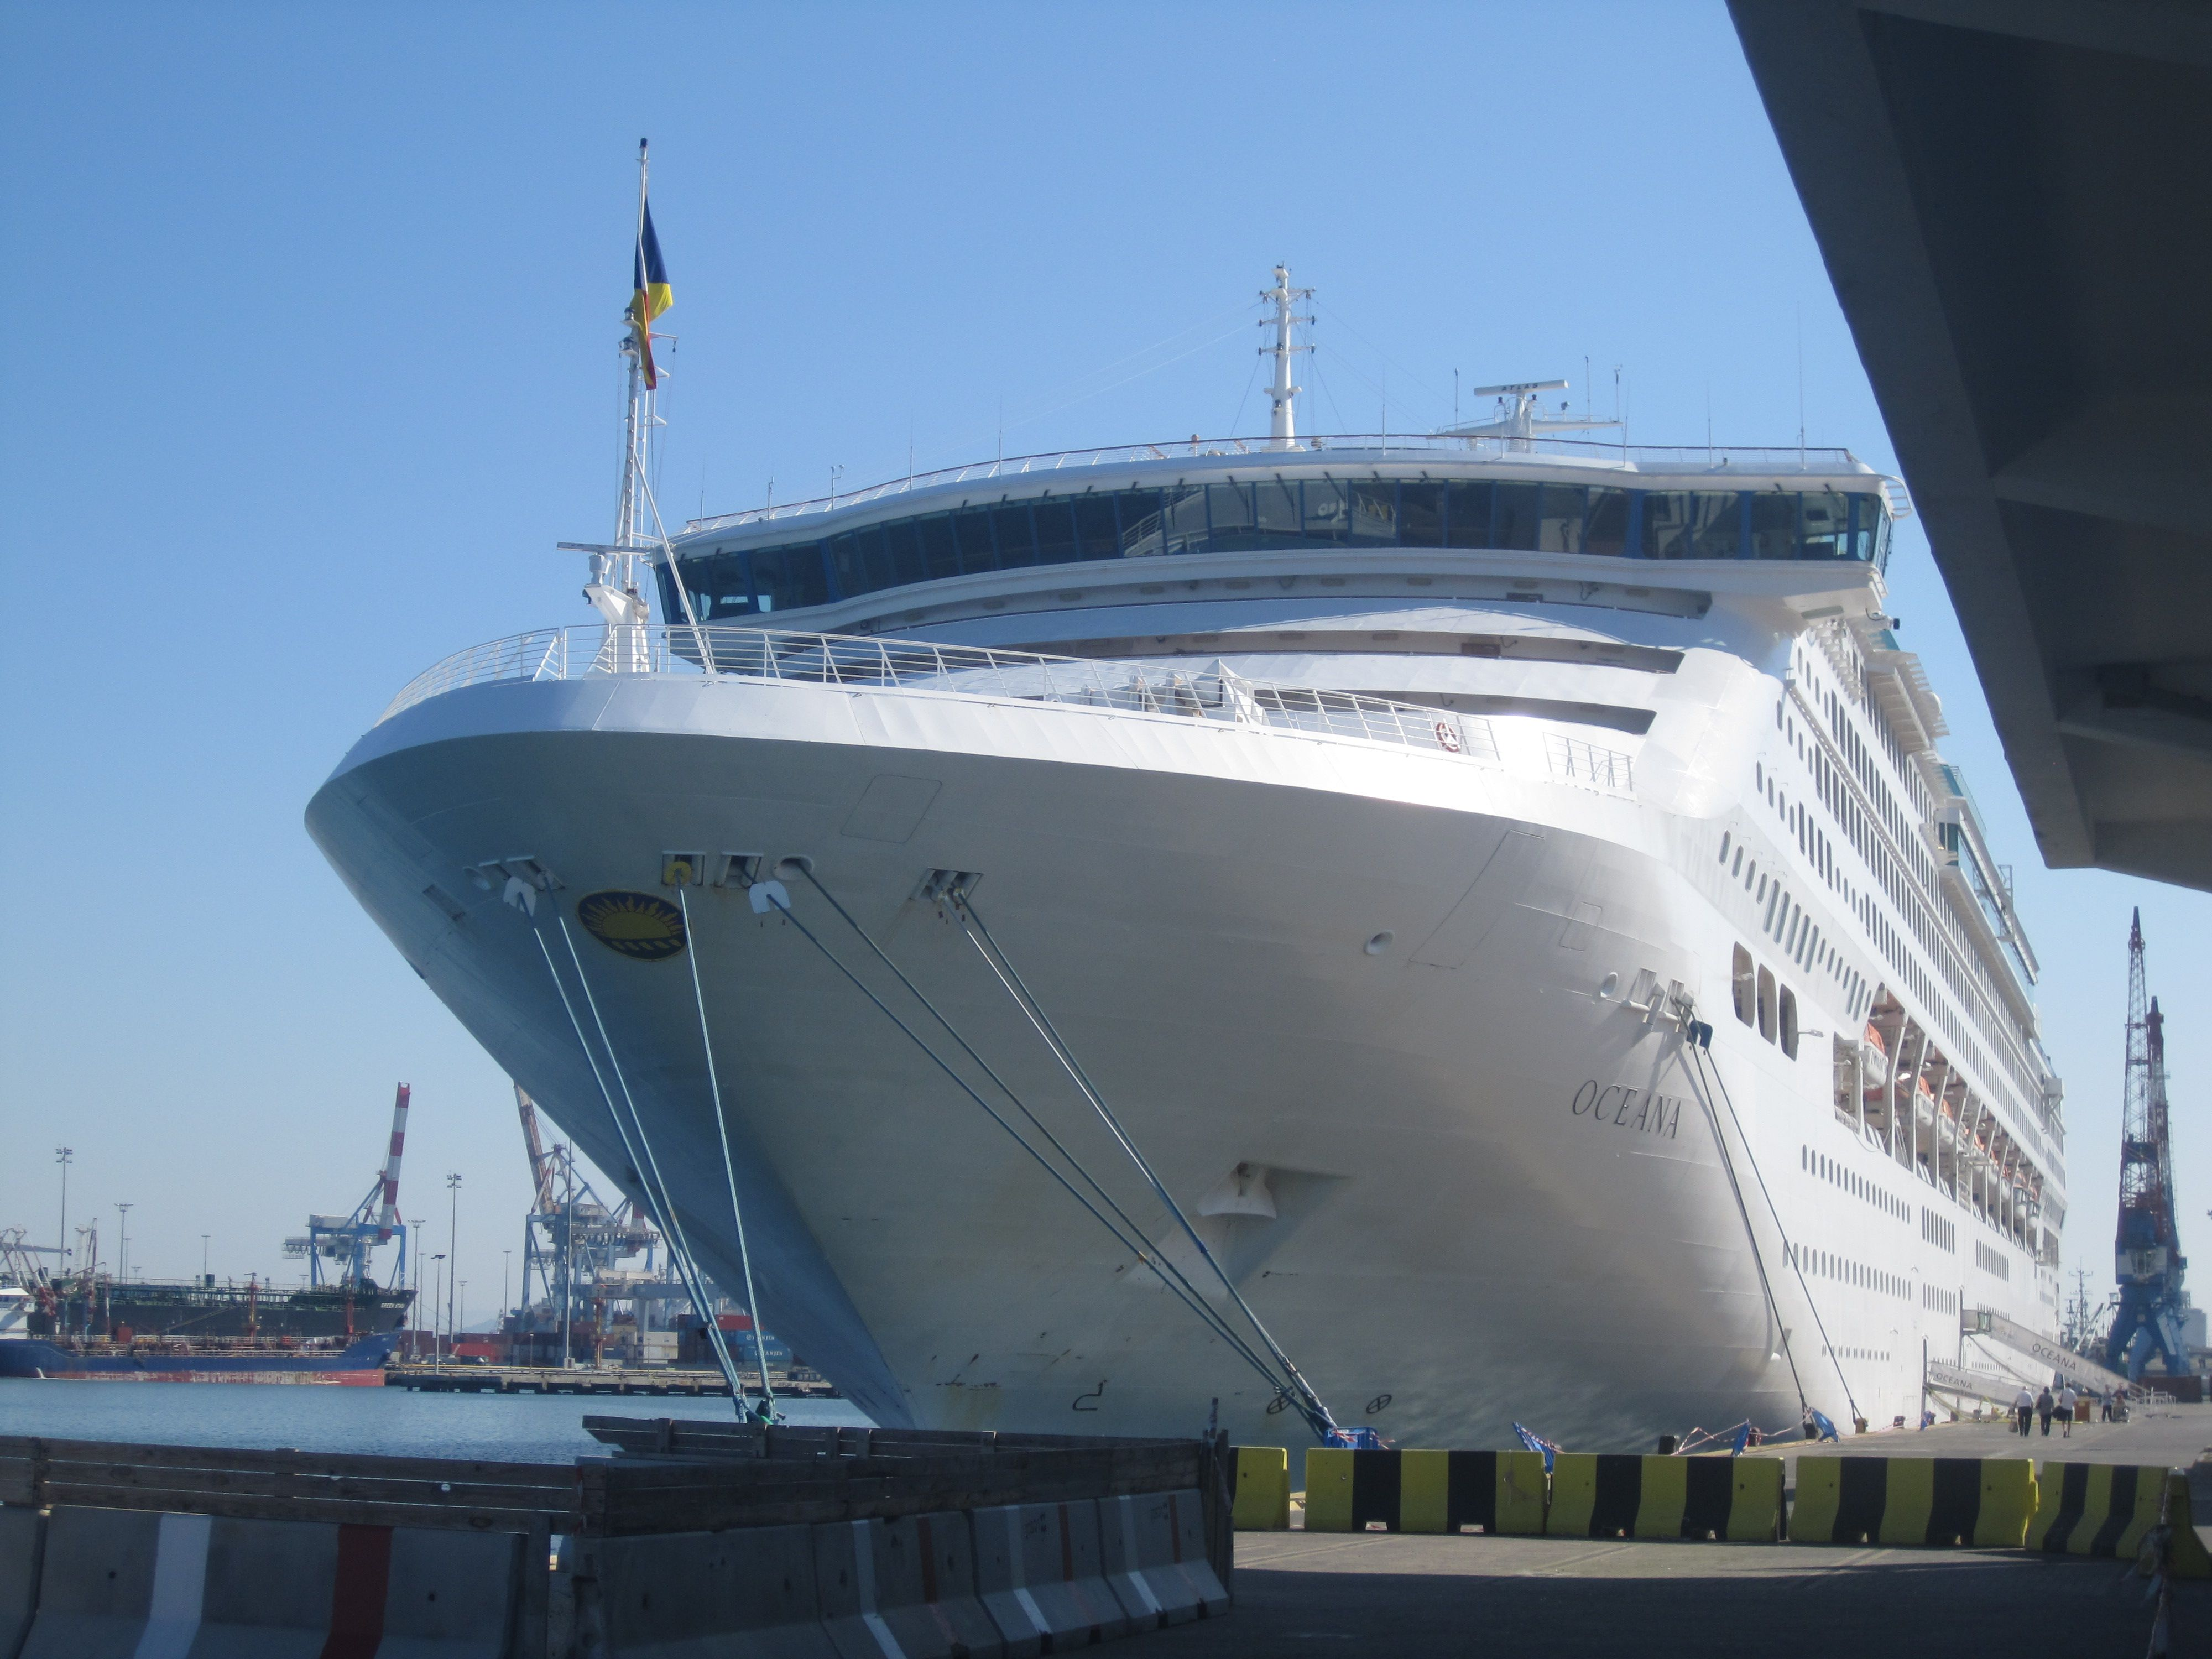 Oceana docked in Haifa #cruise #cruiseblog #travel #wanderlust #lovetravel #cruiselife #visioncruise #seethedifference #cruisetv #travelbloggers #cruisedeals #d…